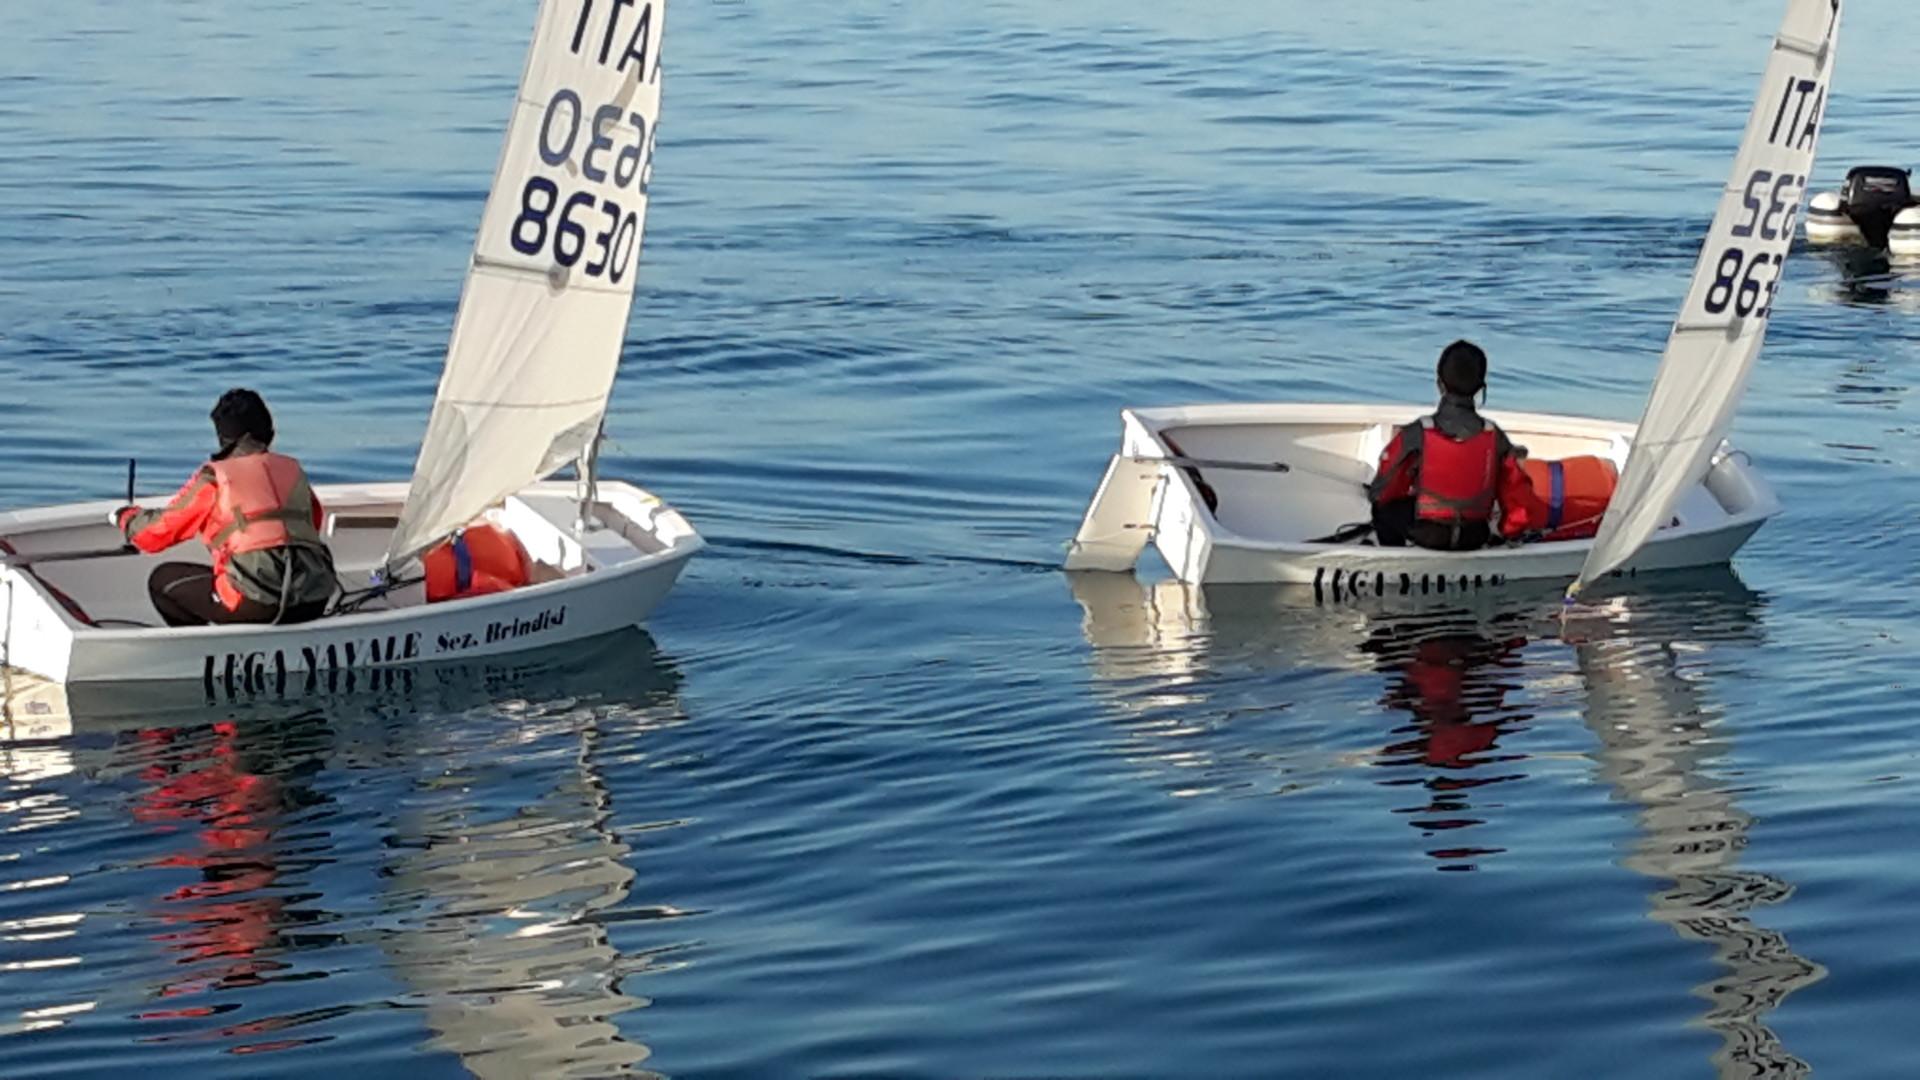 Scuola-di-vela-lega-navale-LNI-Brindisi (9)